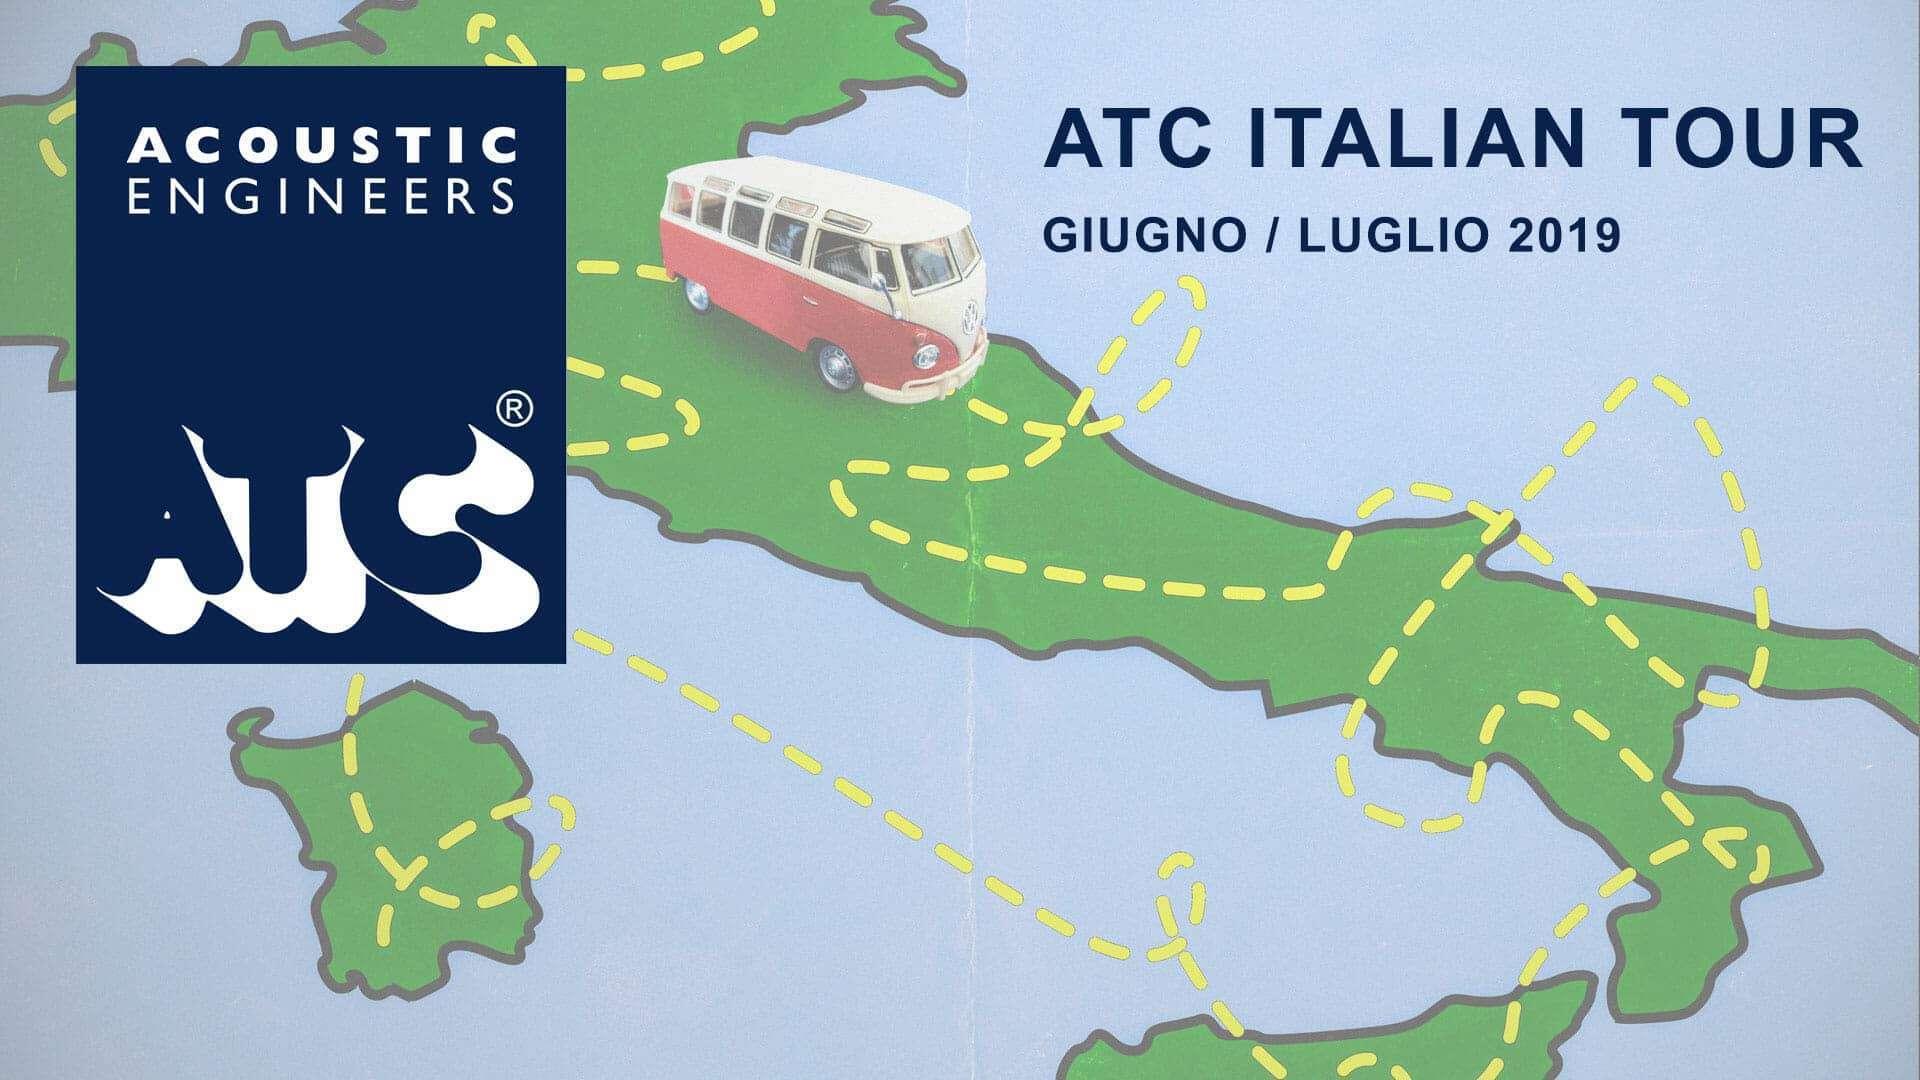 ATC Italian Tour